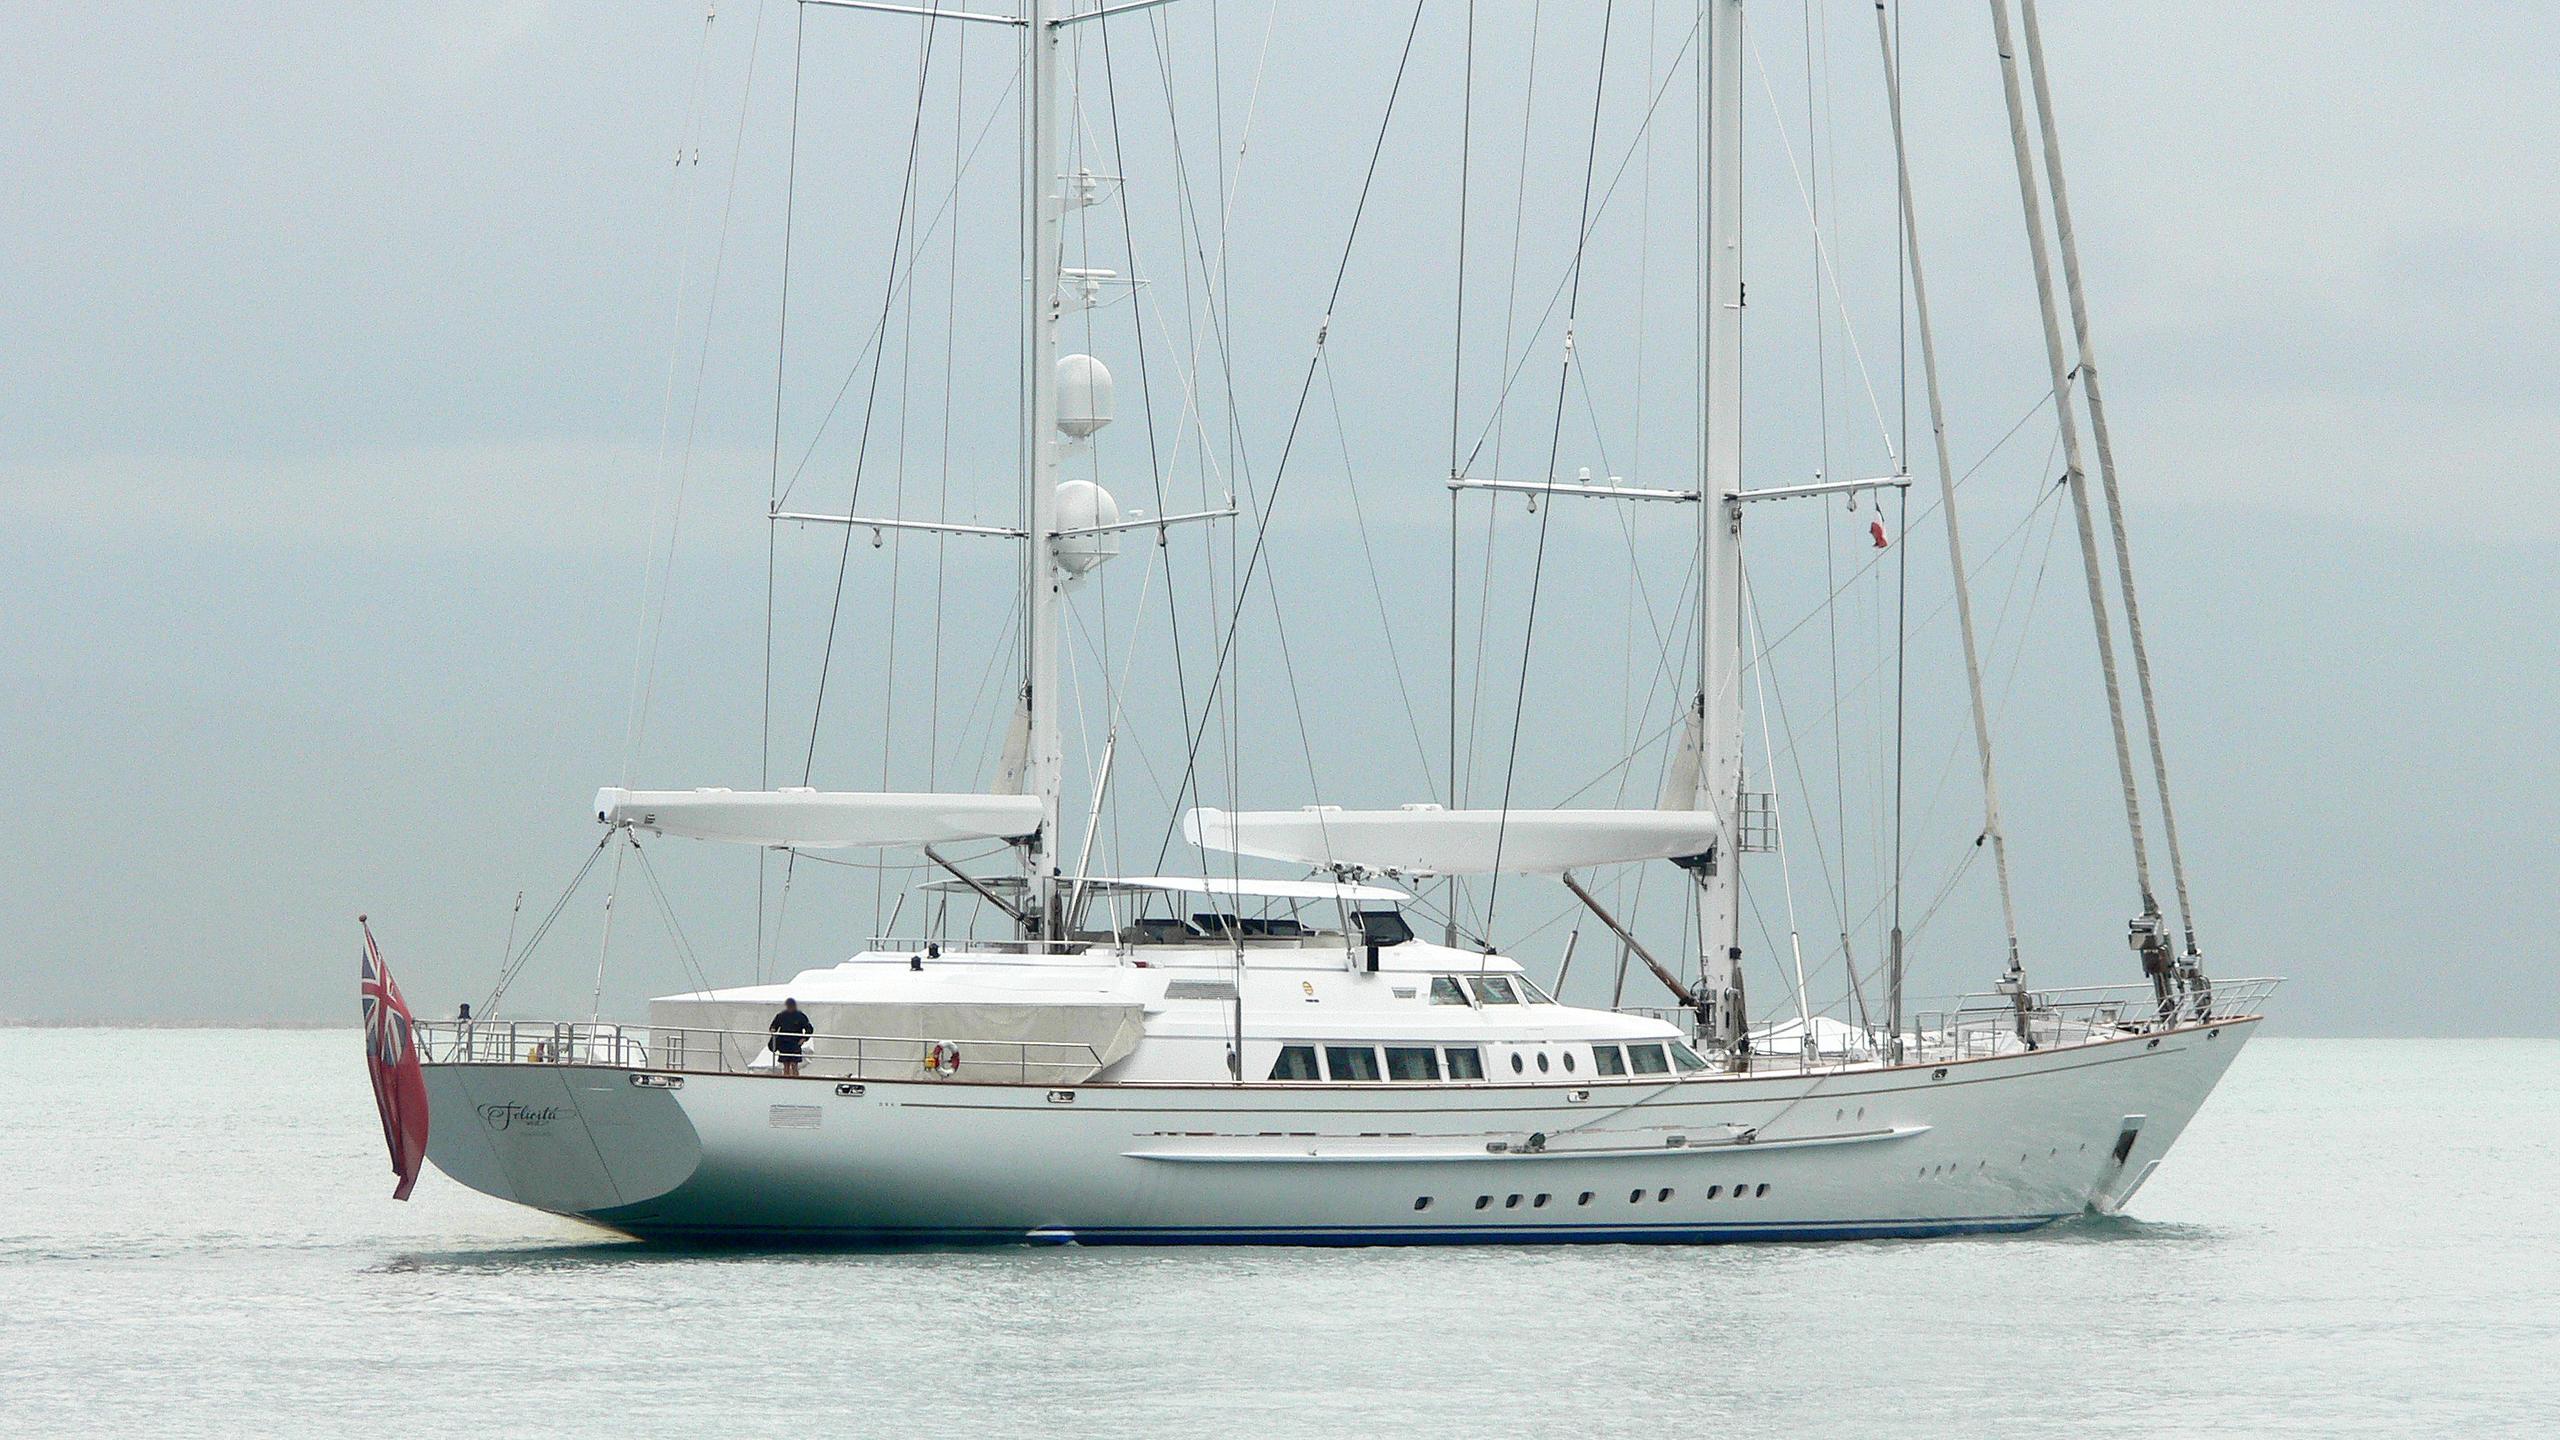 spirit-of-the-cs-sailing-yacht-perini-navi-2003-64m-moored-stern